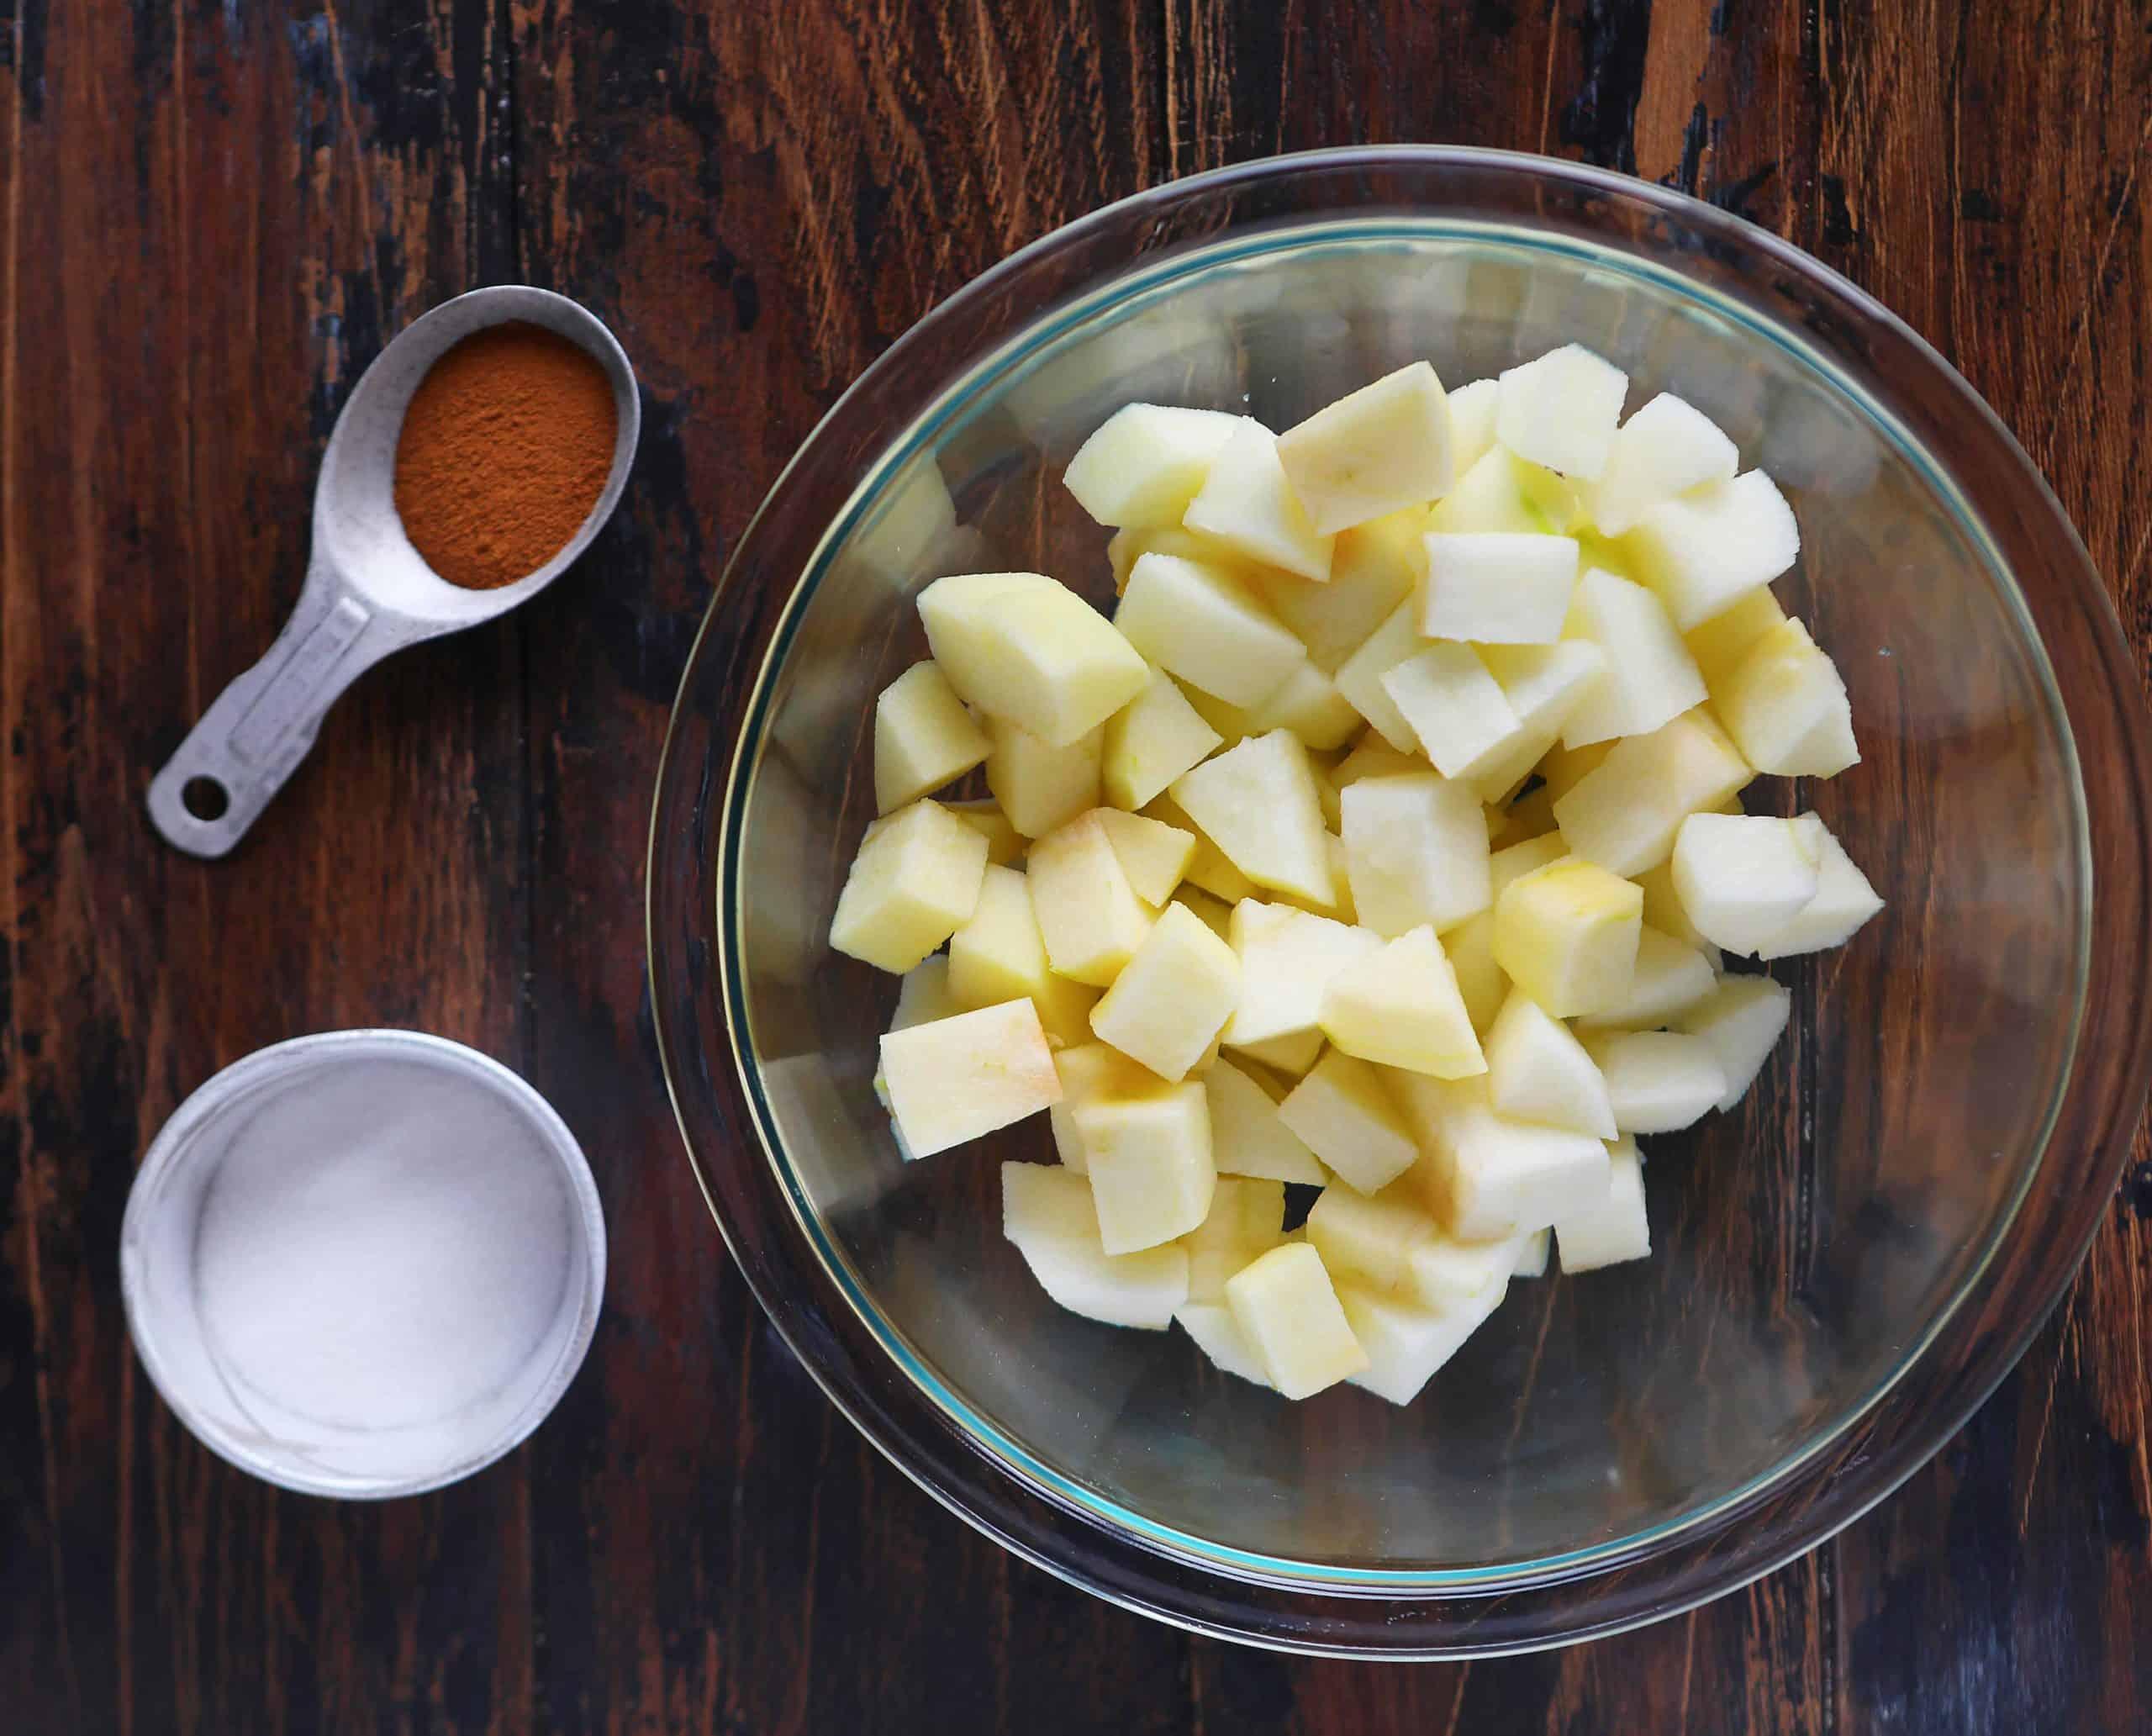 How to make artisan apple bread